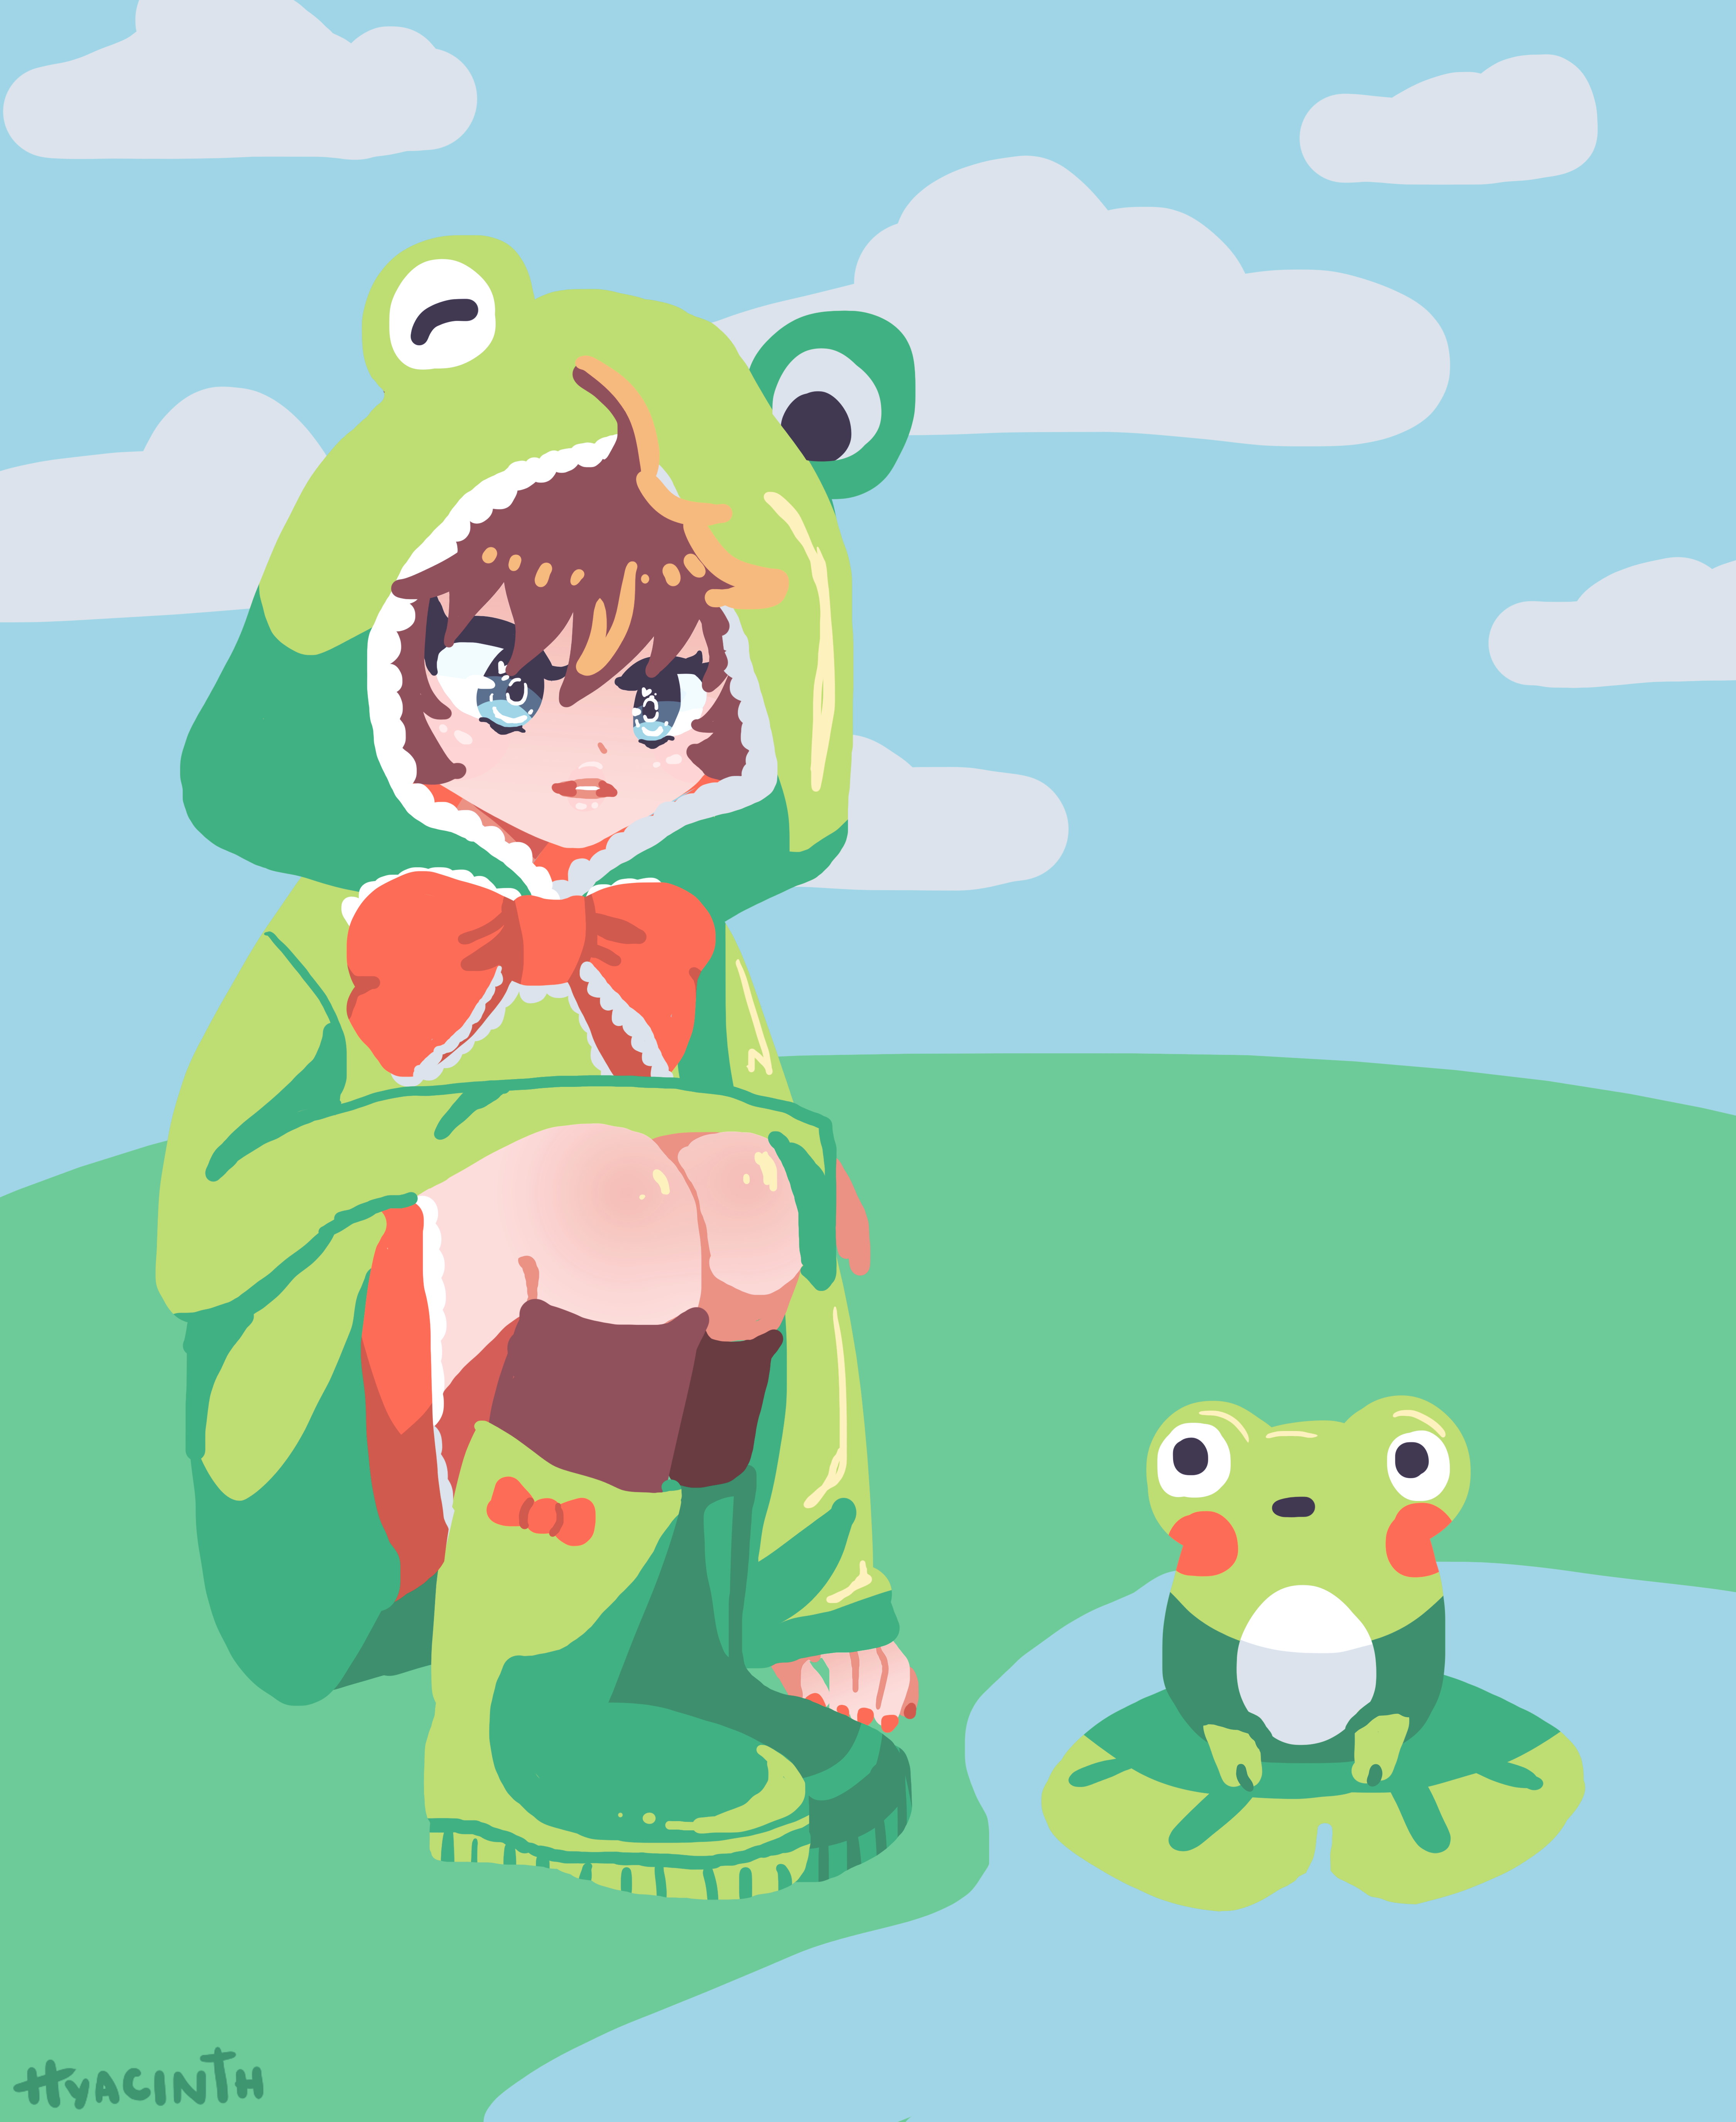 frog_dtiys.png